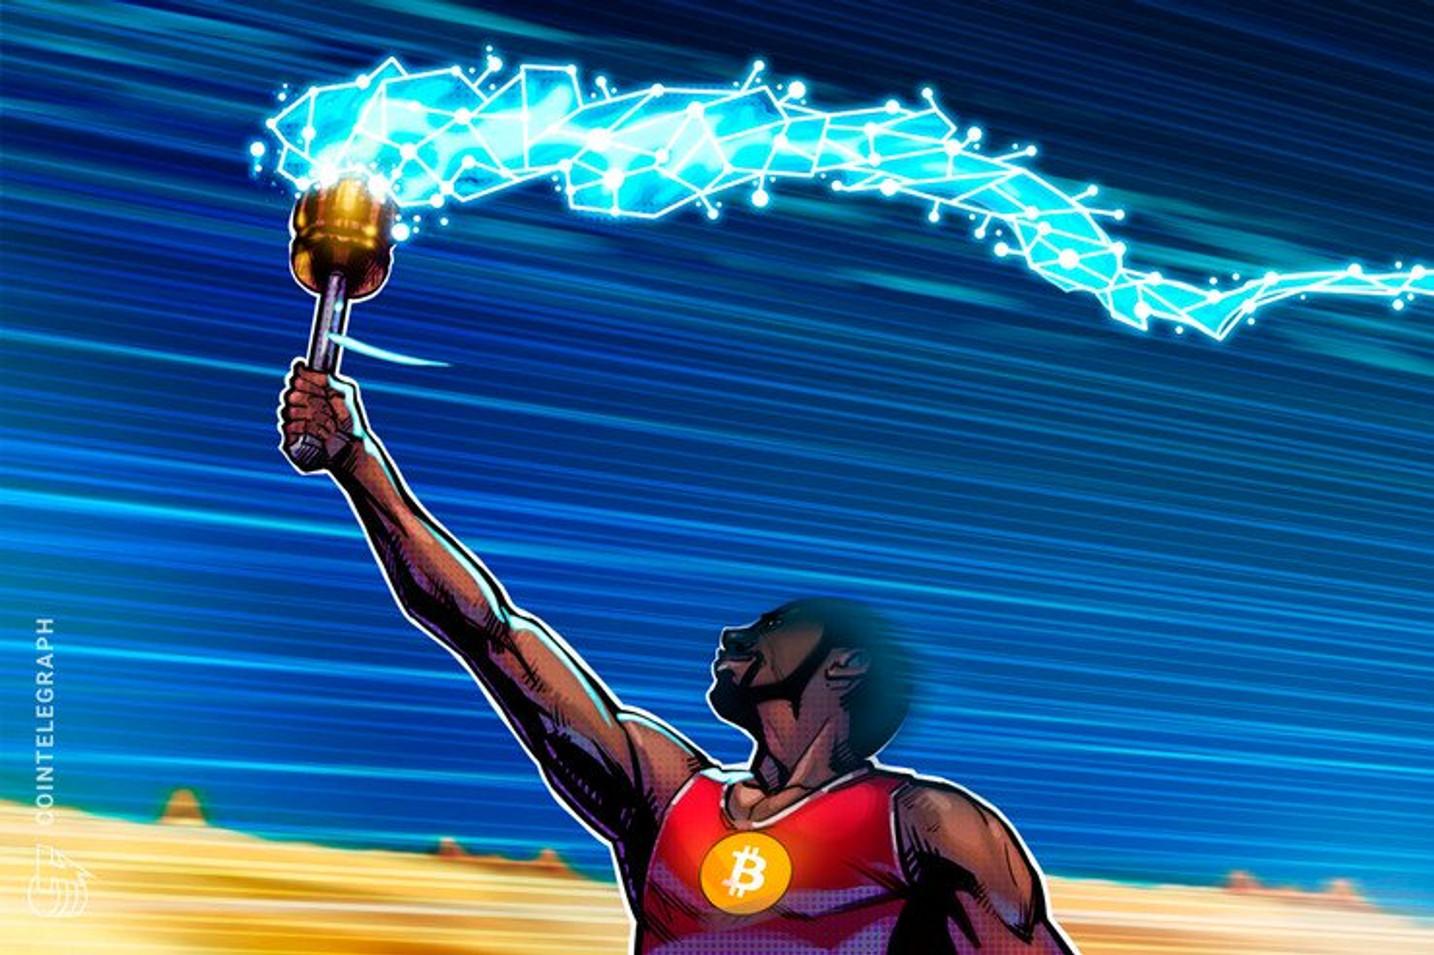 'Chefona' da Lightning Network do Bitcoin, Elizabeth Stark, fará palestra no Brasil depois do carnaval